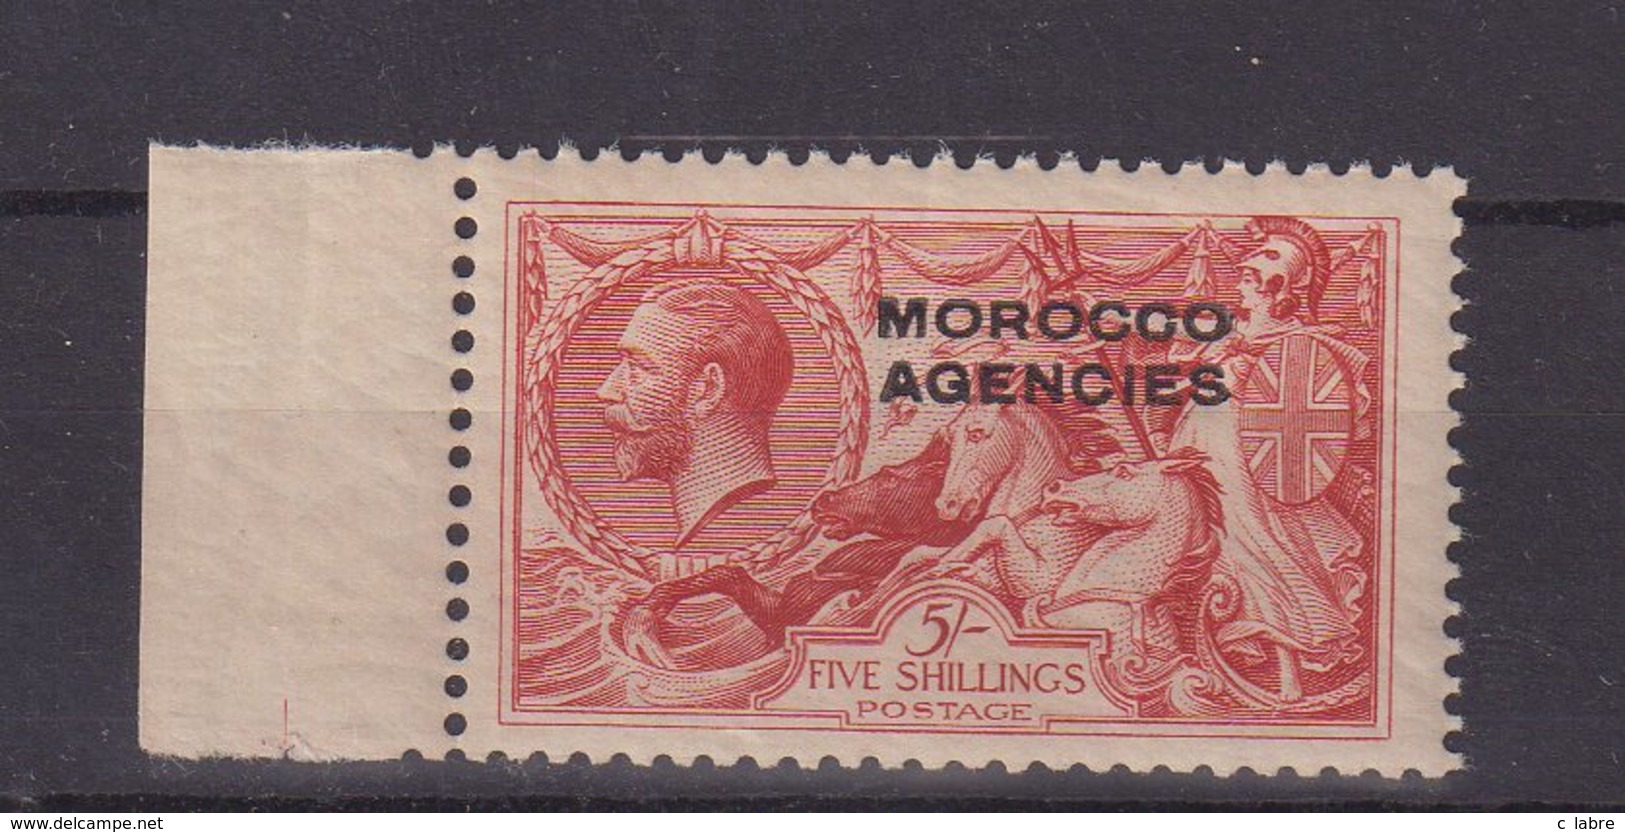 MAROC : BX ANGLAIS . TOUS LES BUREAUX . N° 18 ** . BDF . LUXE . 1914/31 . ( CATALOGUE YVERT ) . - Morocco Agencies / Tangier (...-1958)